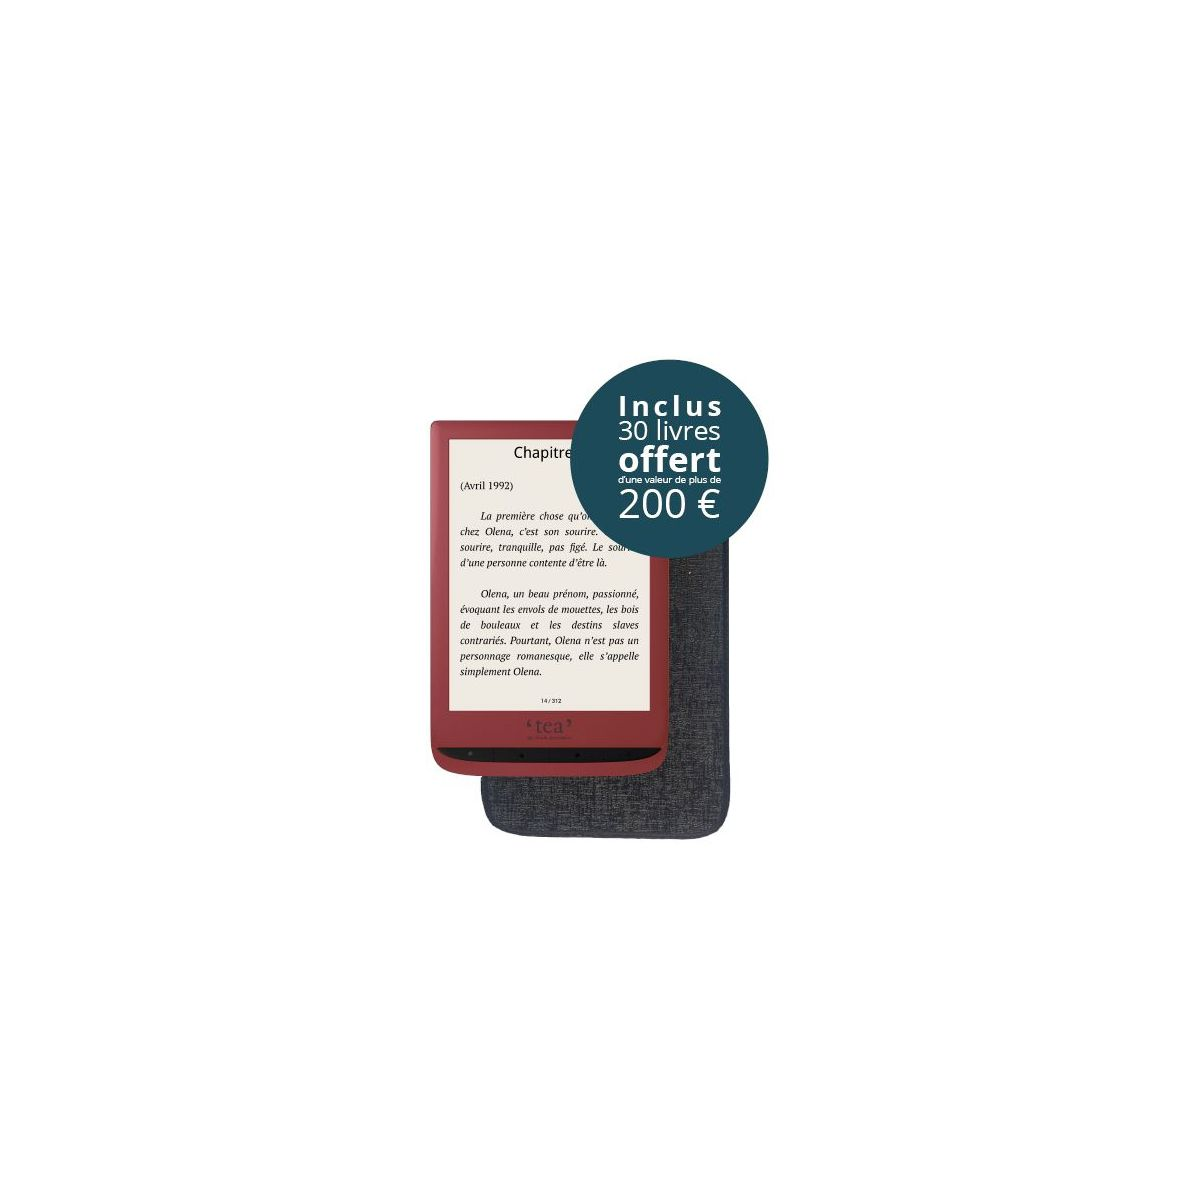 e-book TEA Pack Touch Lux 4 rouge + housse +10Epub (photo)